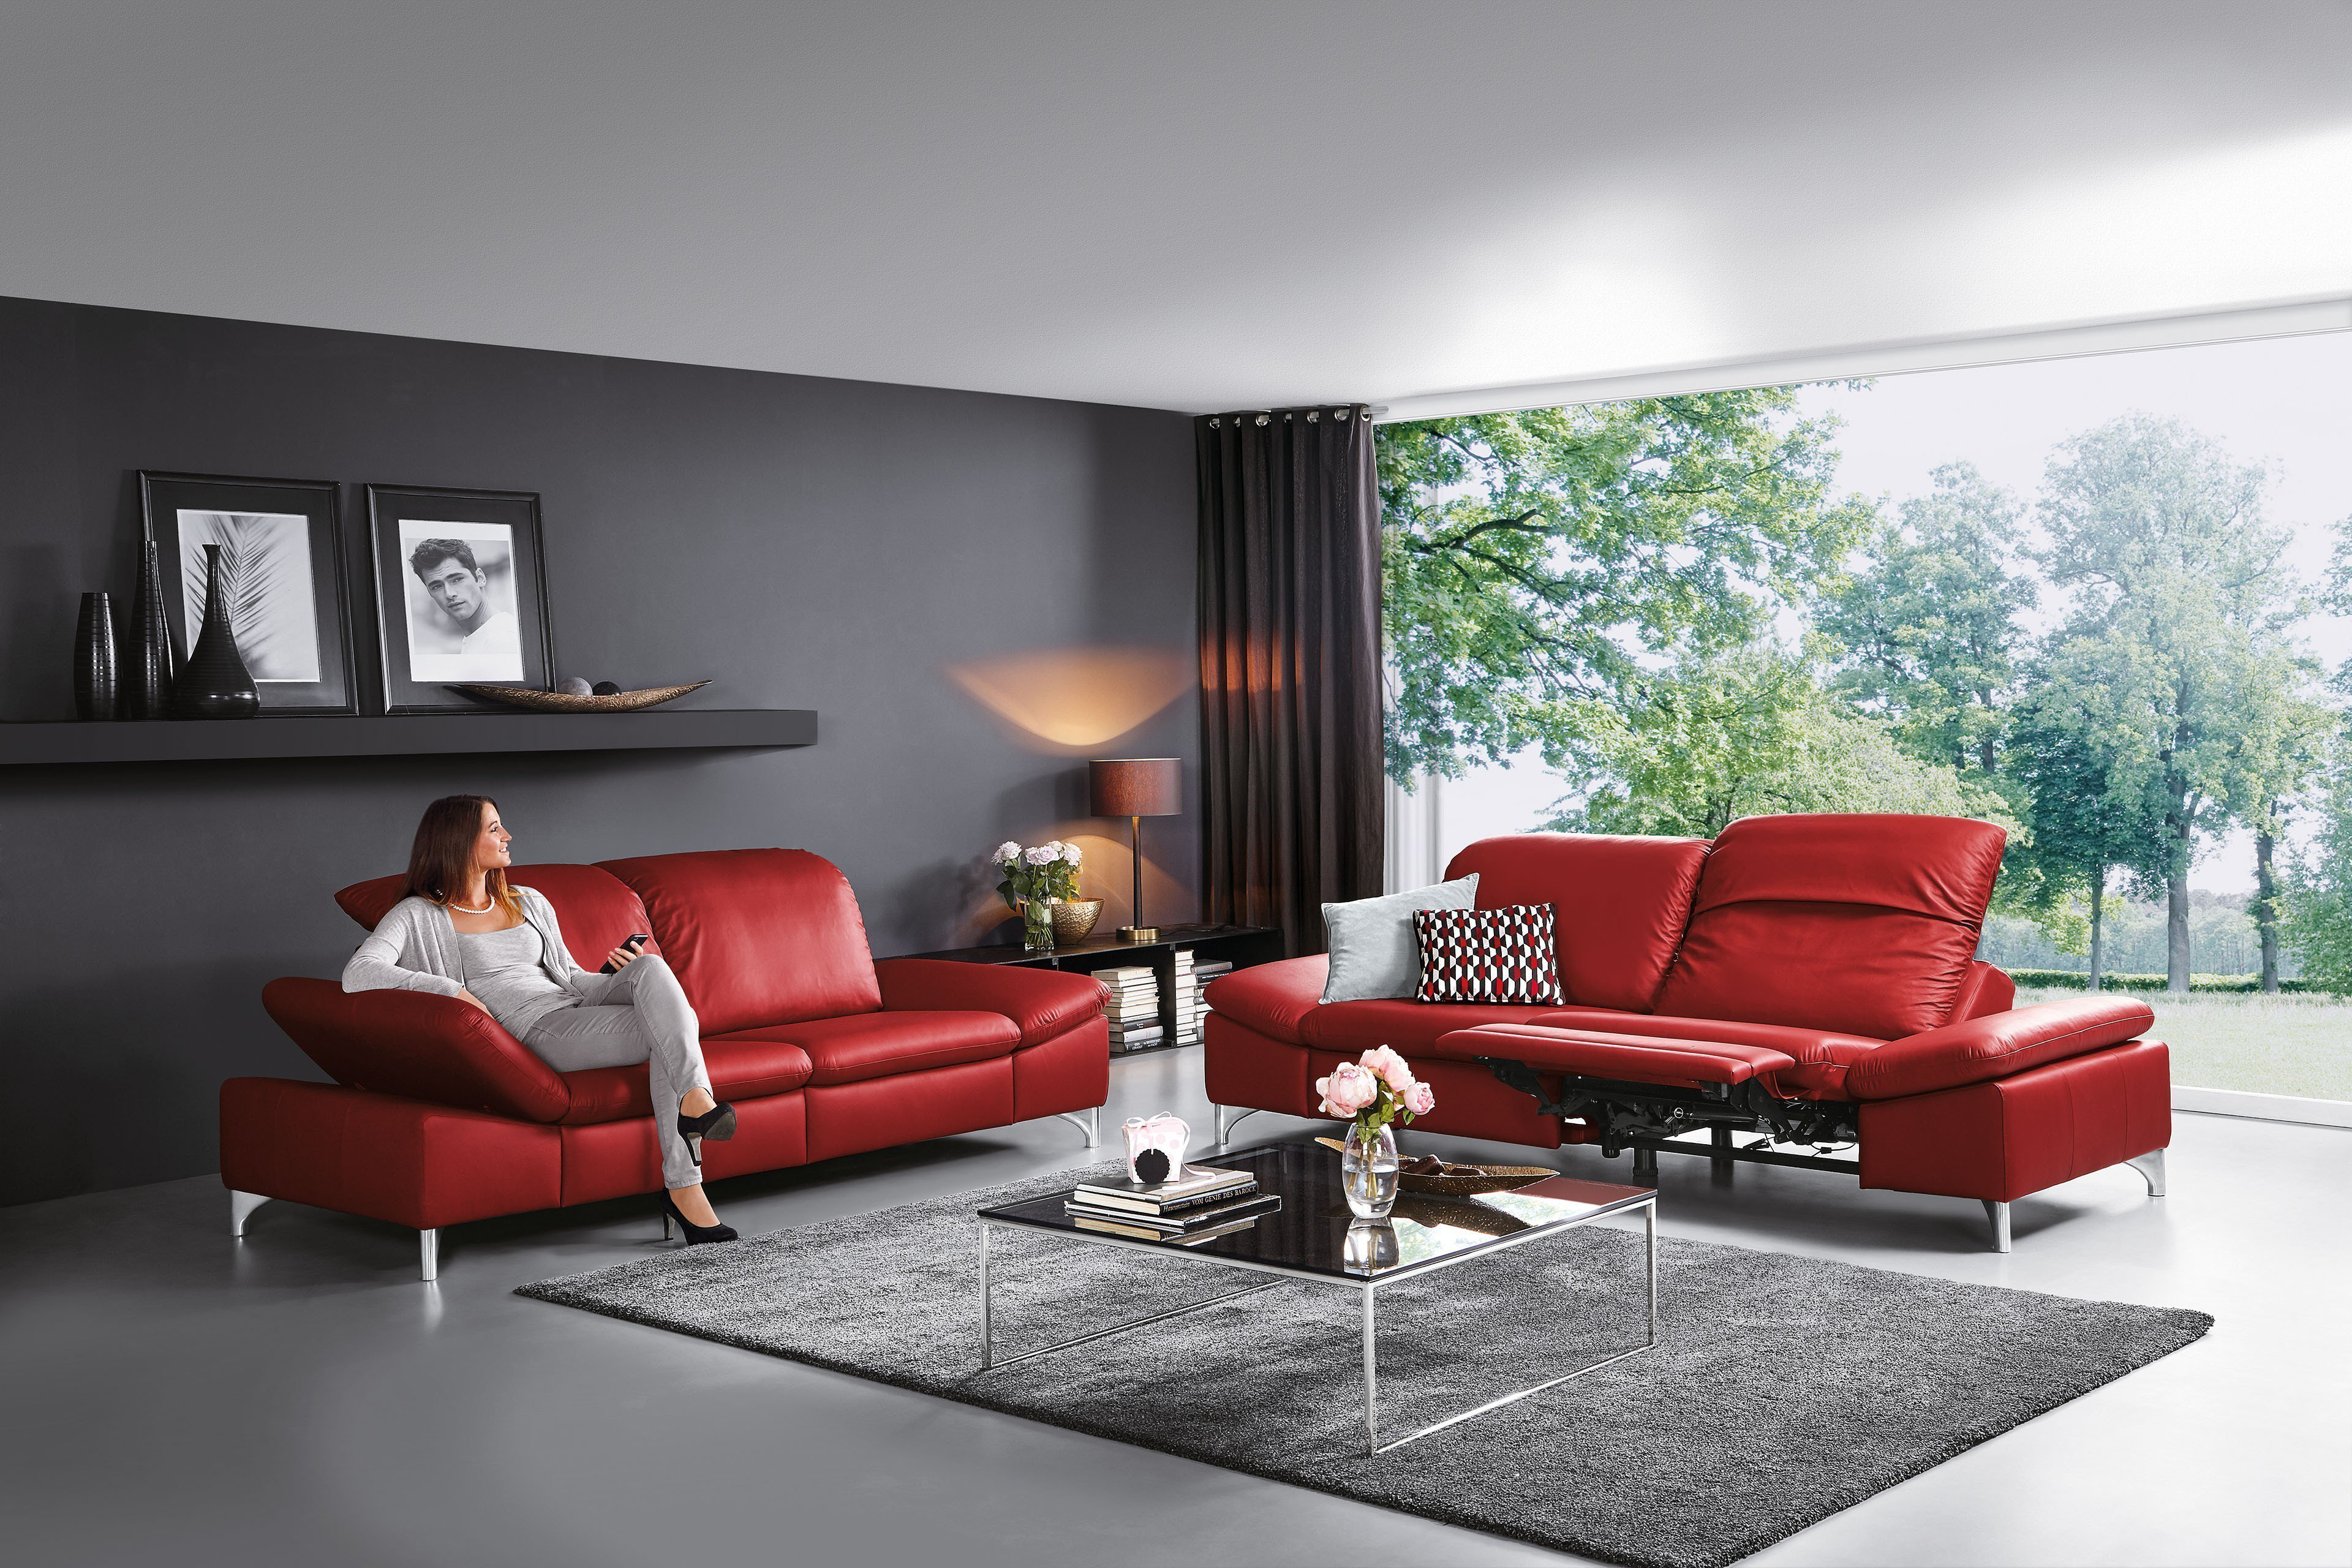 w schillig enjoy enjoy german house wandtattoo eigenes. Black Bedroom Furniture Sets. Home Design Ideas